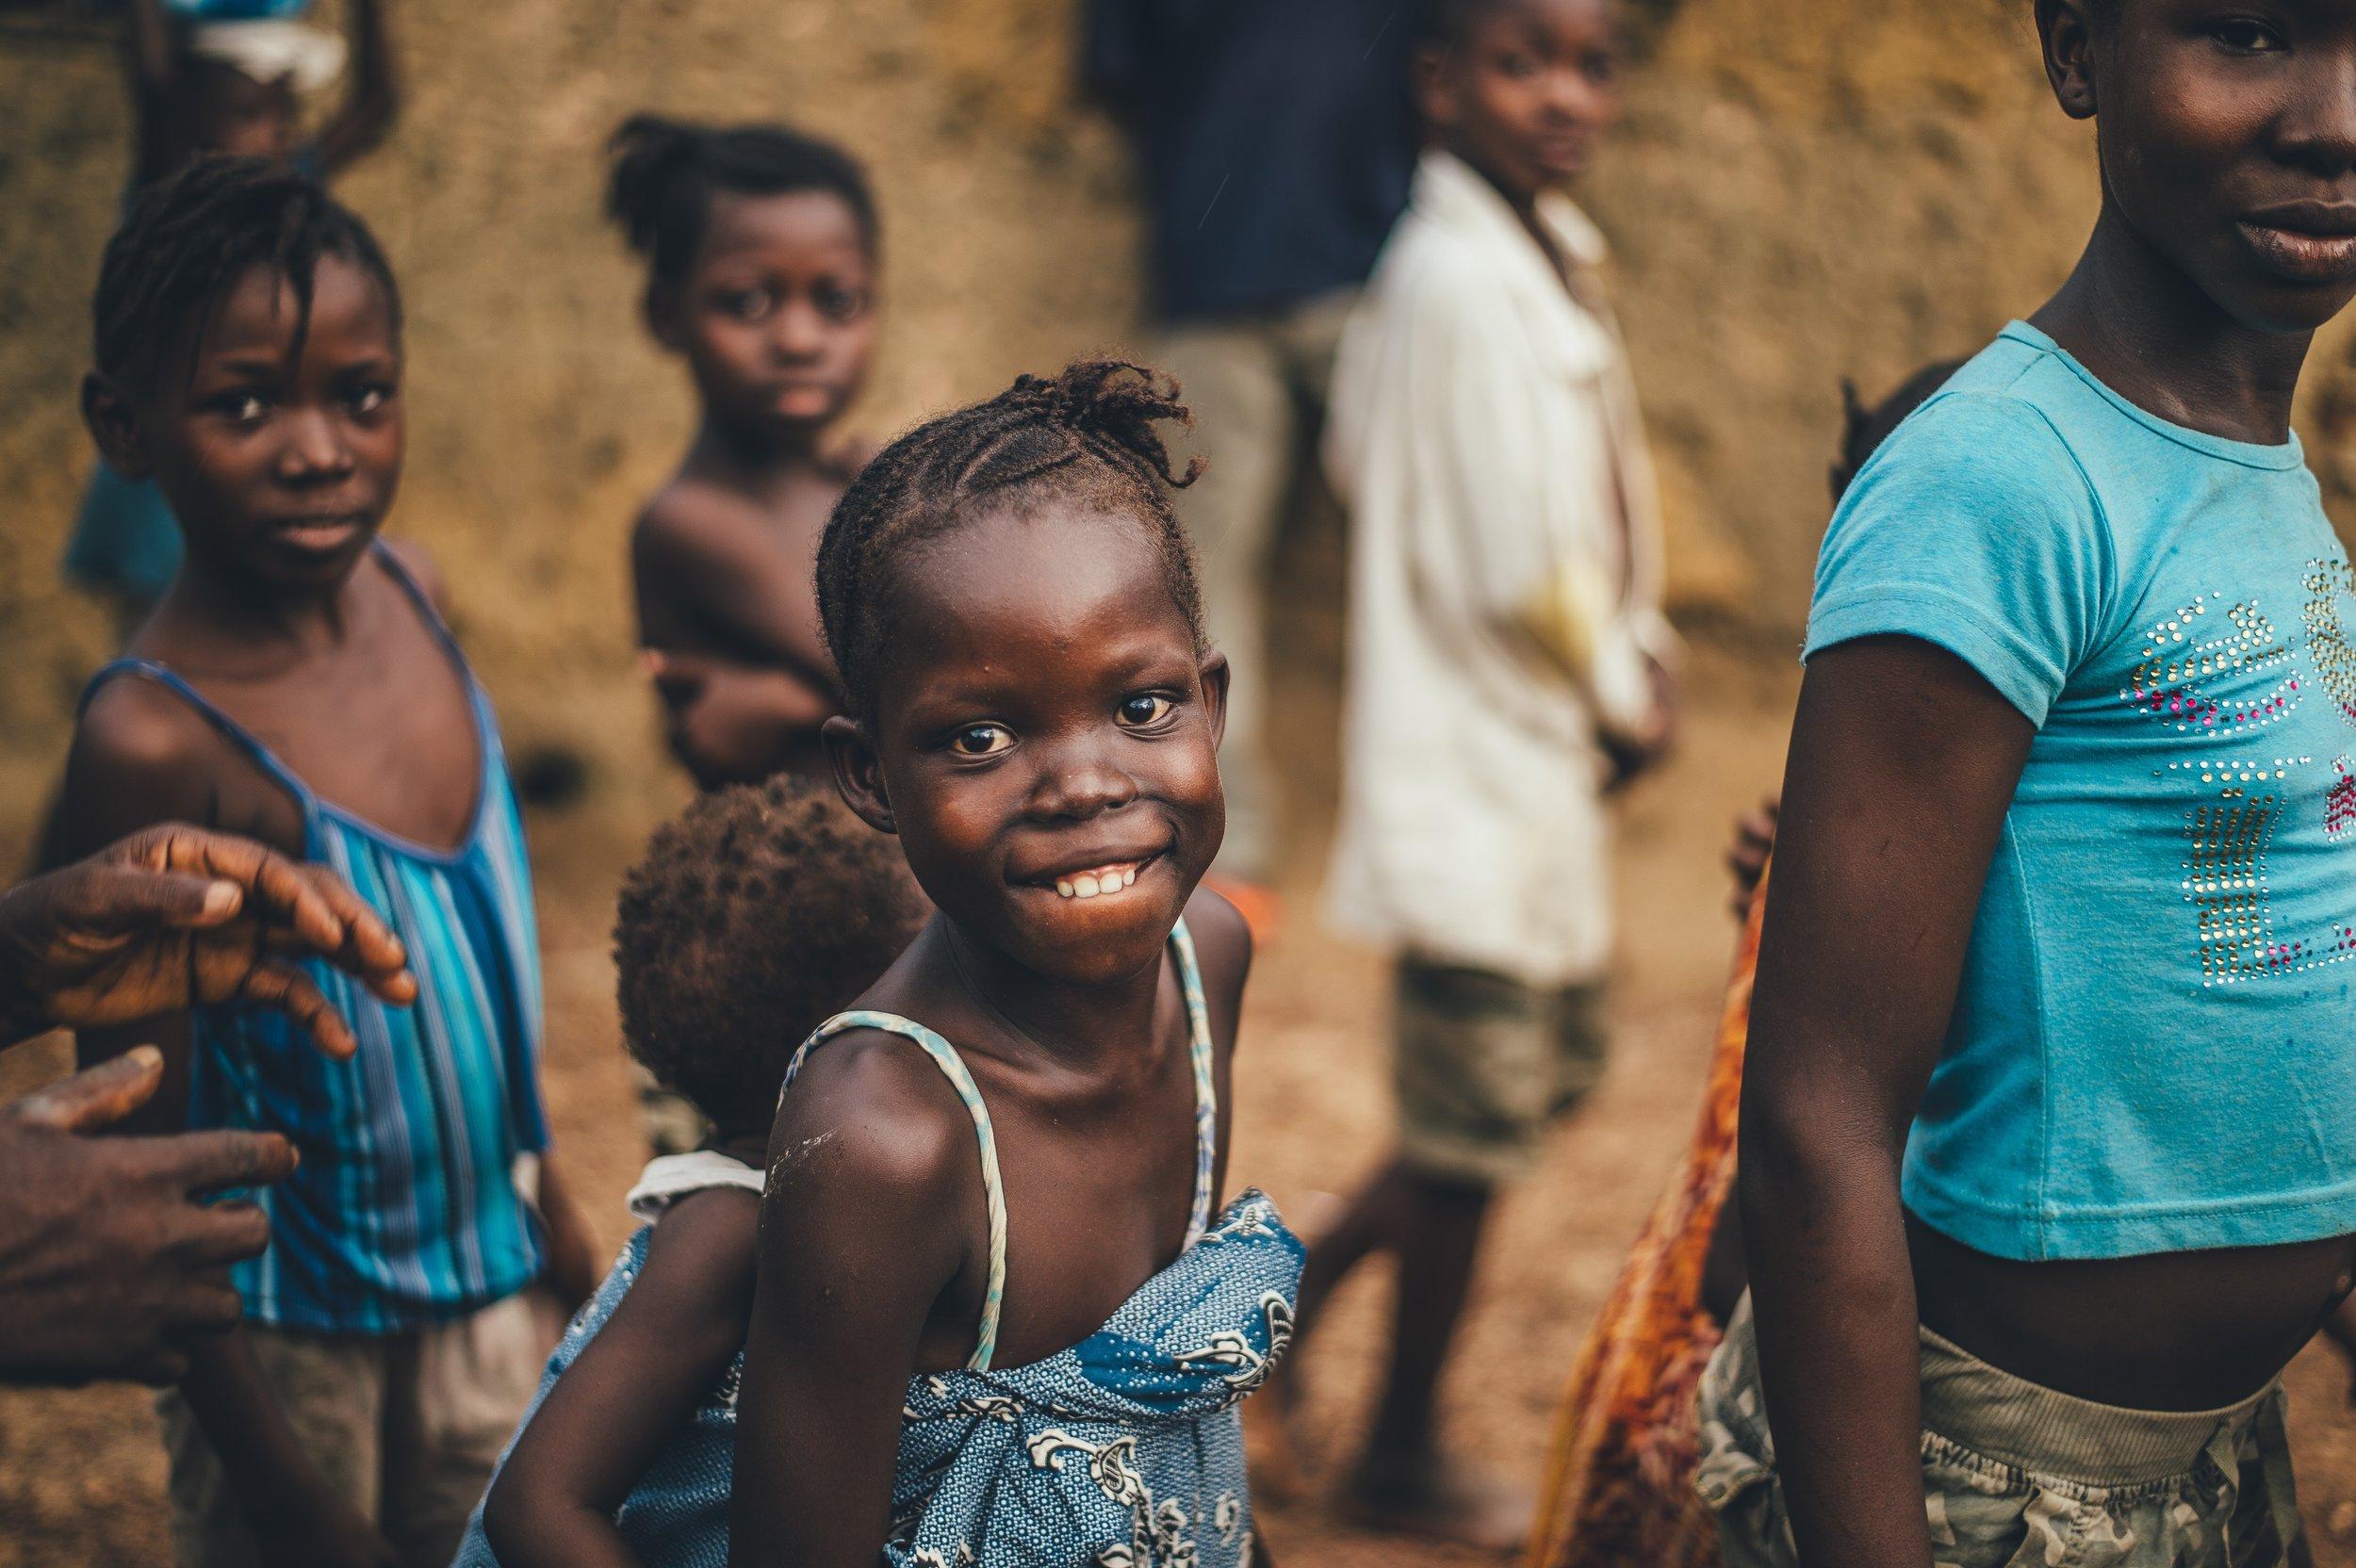 Africa-crowd-DRC-EbolaFund.jpg